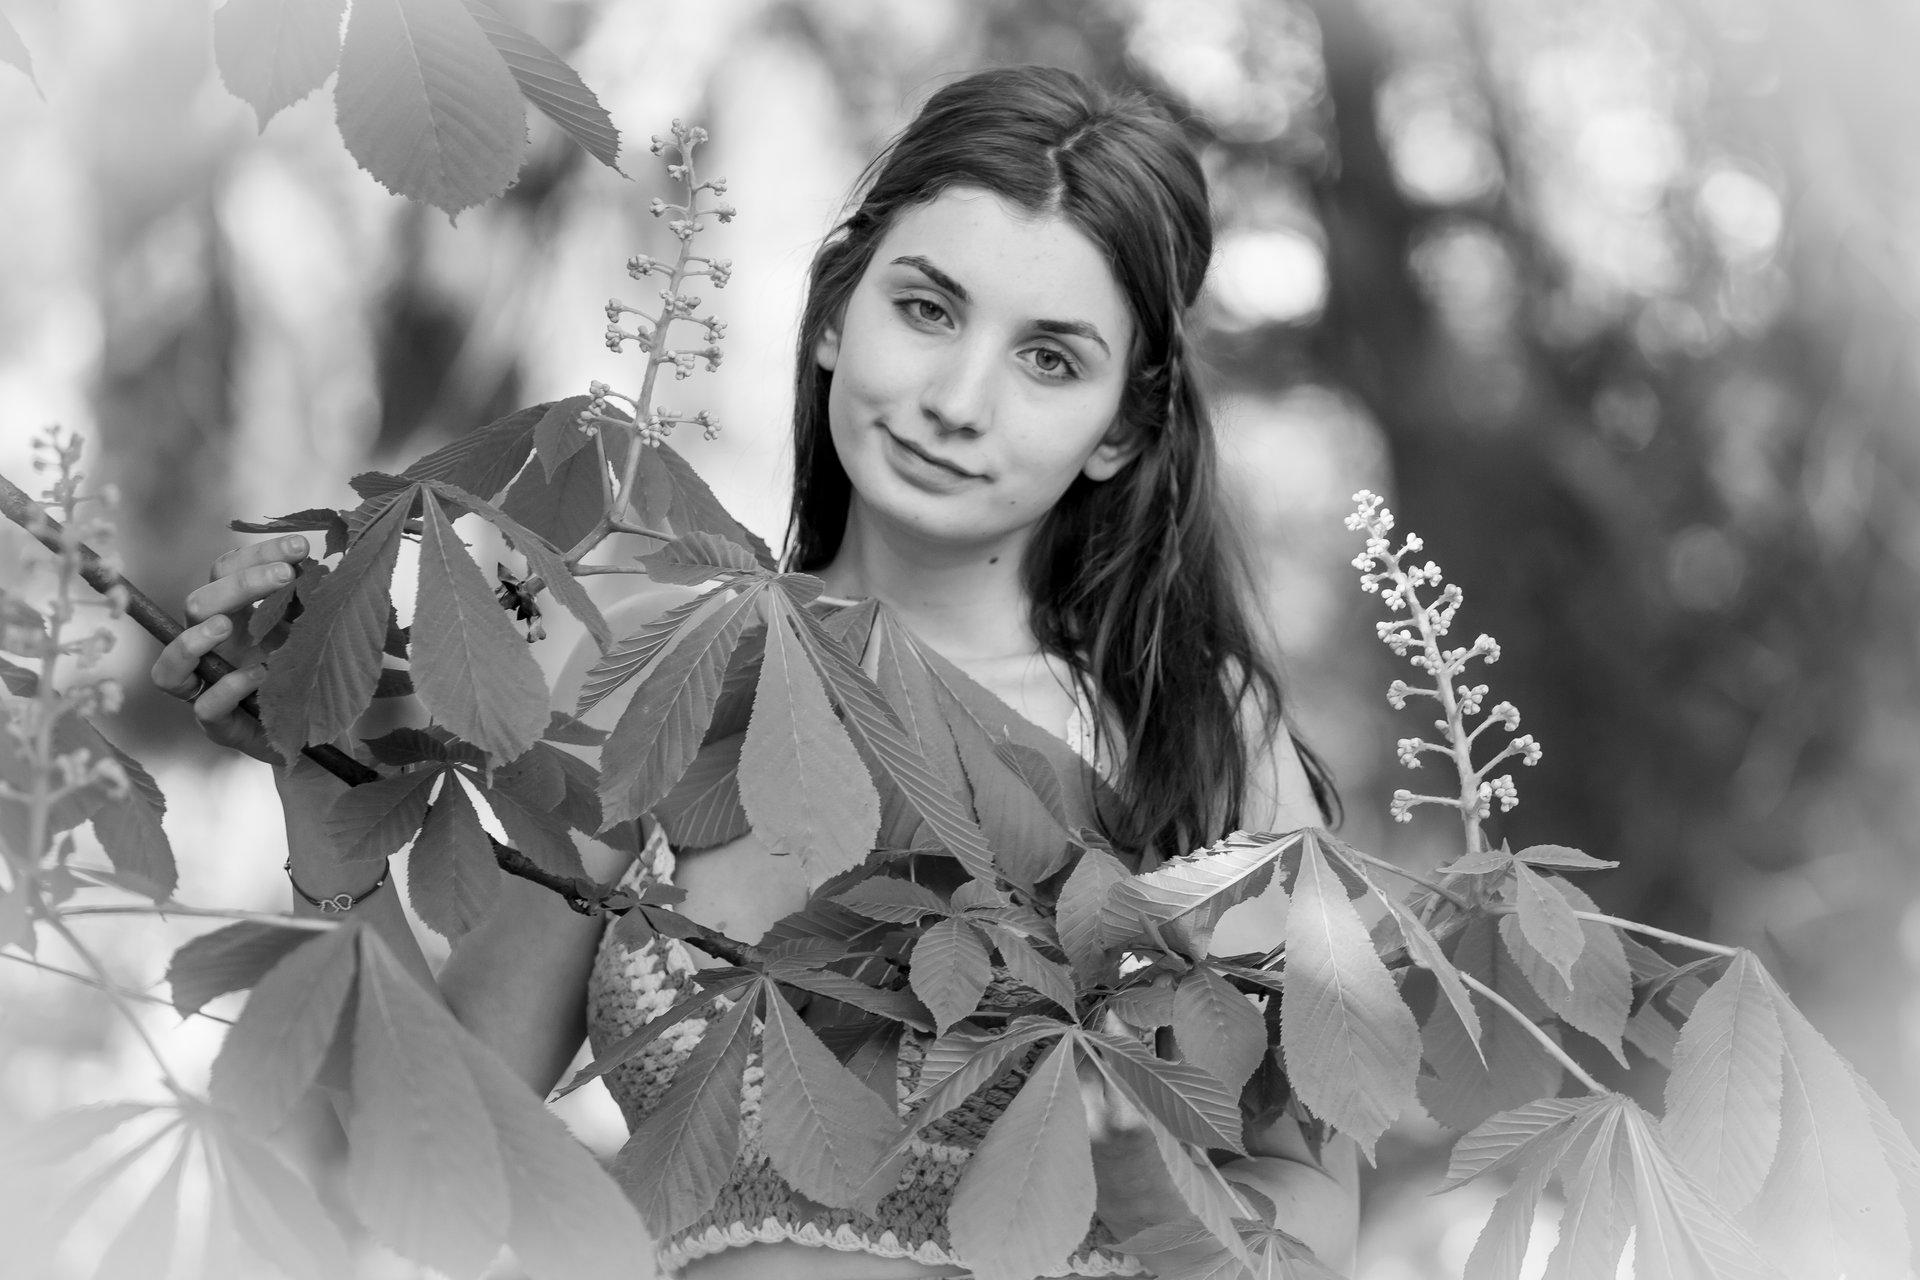 Портрет | Author Lyudmil Dimitrov - LDimitrov | PHOTO FORUM